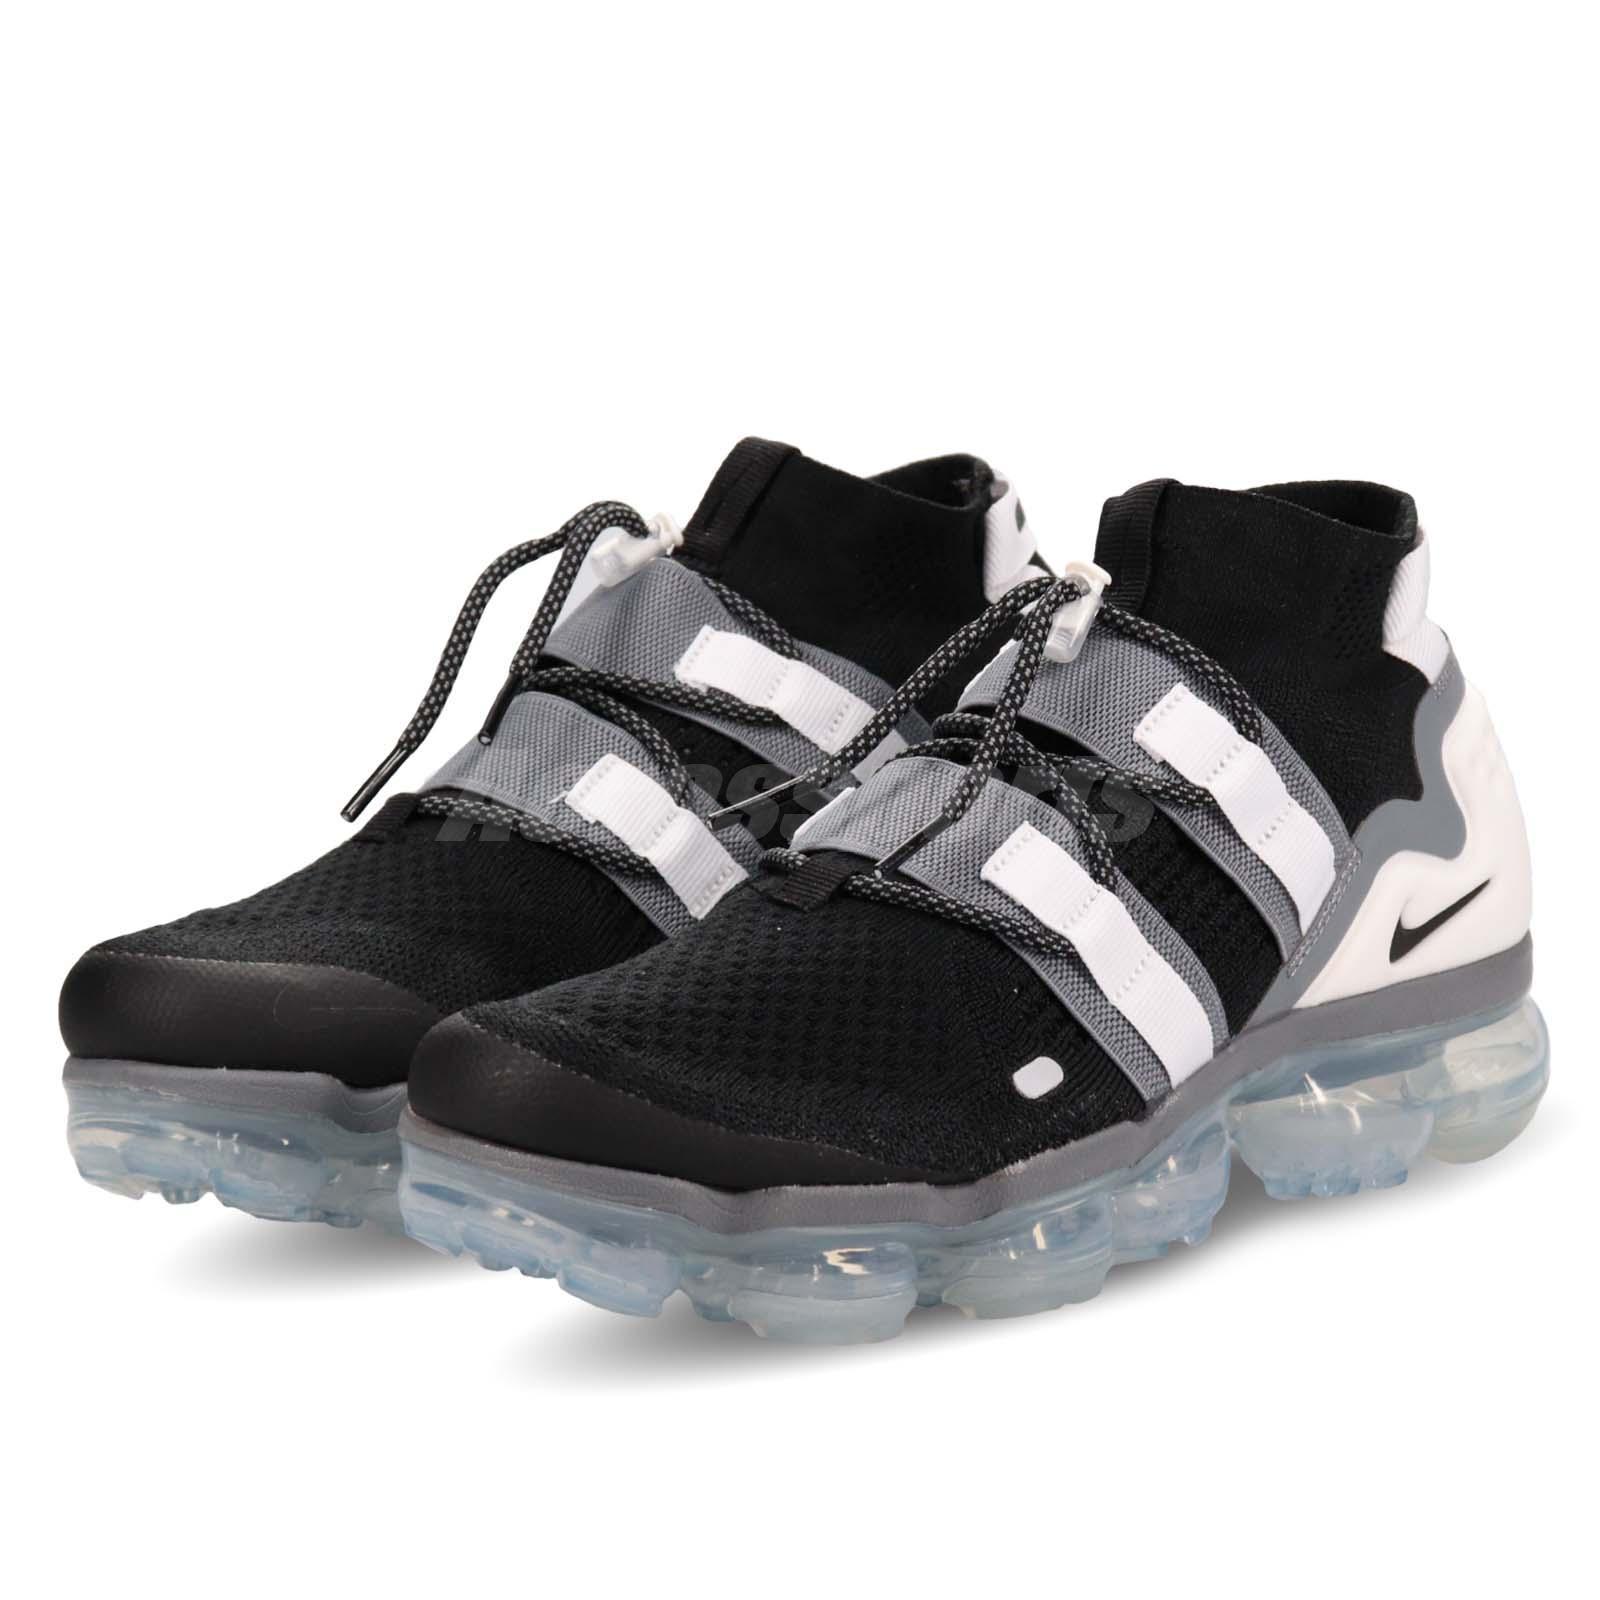 wholesale dealer 8def7 f30a9 Details about Nike Air Vapormax FK Utility Flyknit Black Grey White Men  Shoes AH6834-003